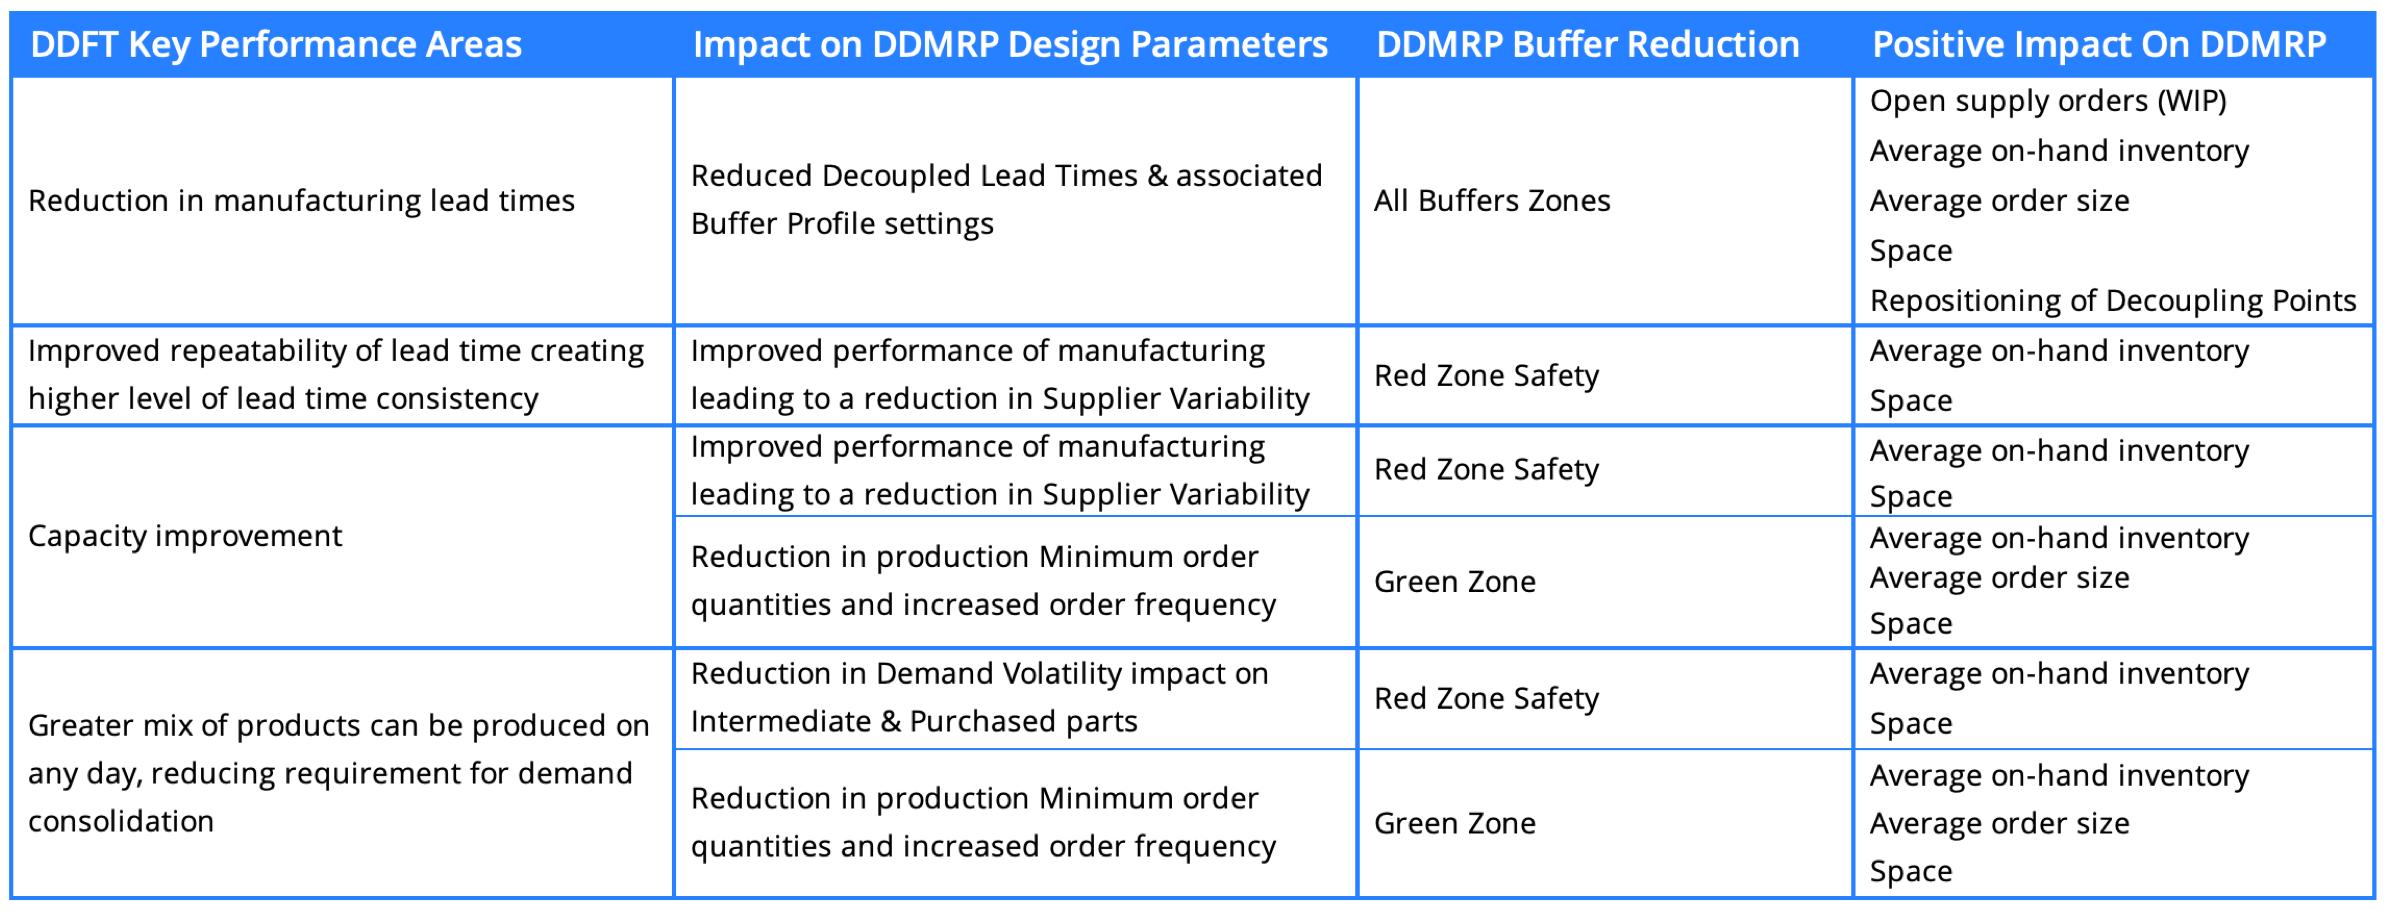 DDFT to DDMRP Benefits